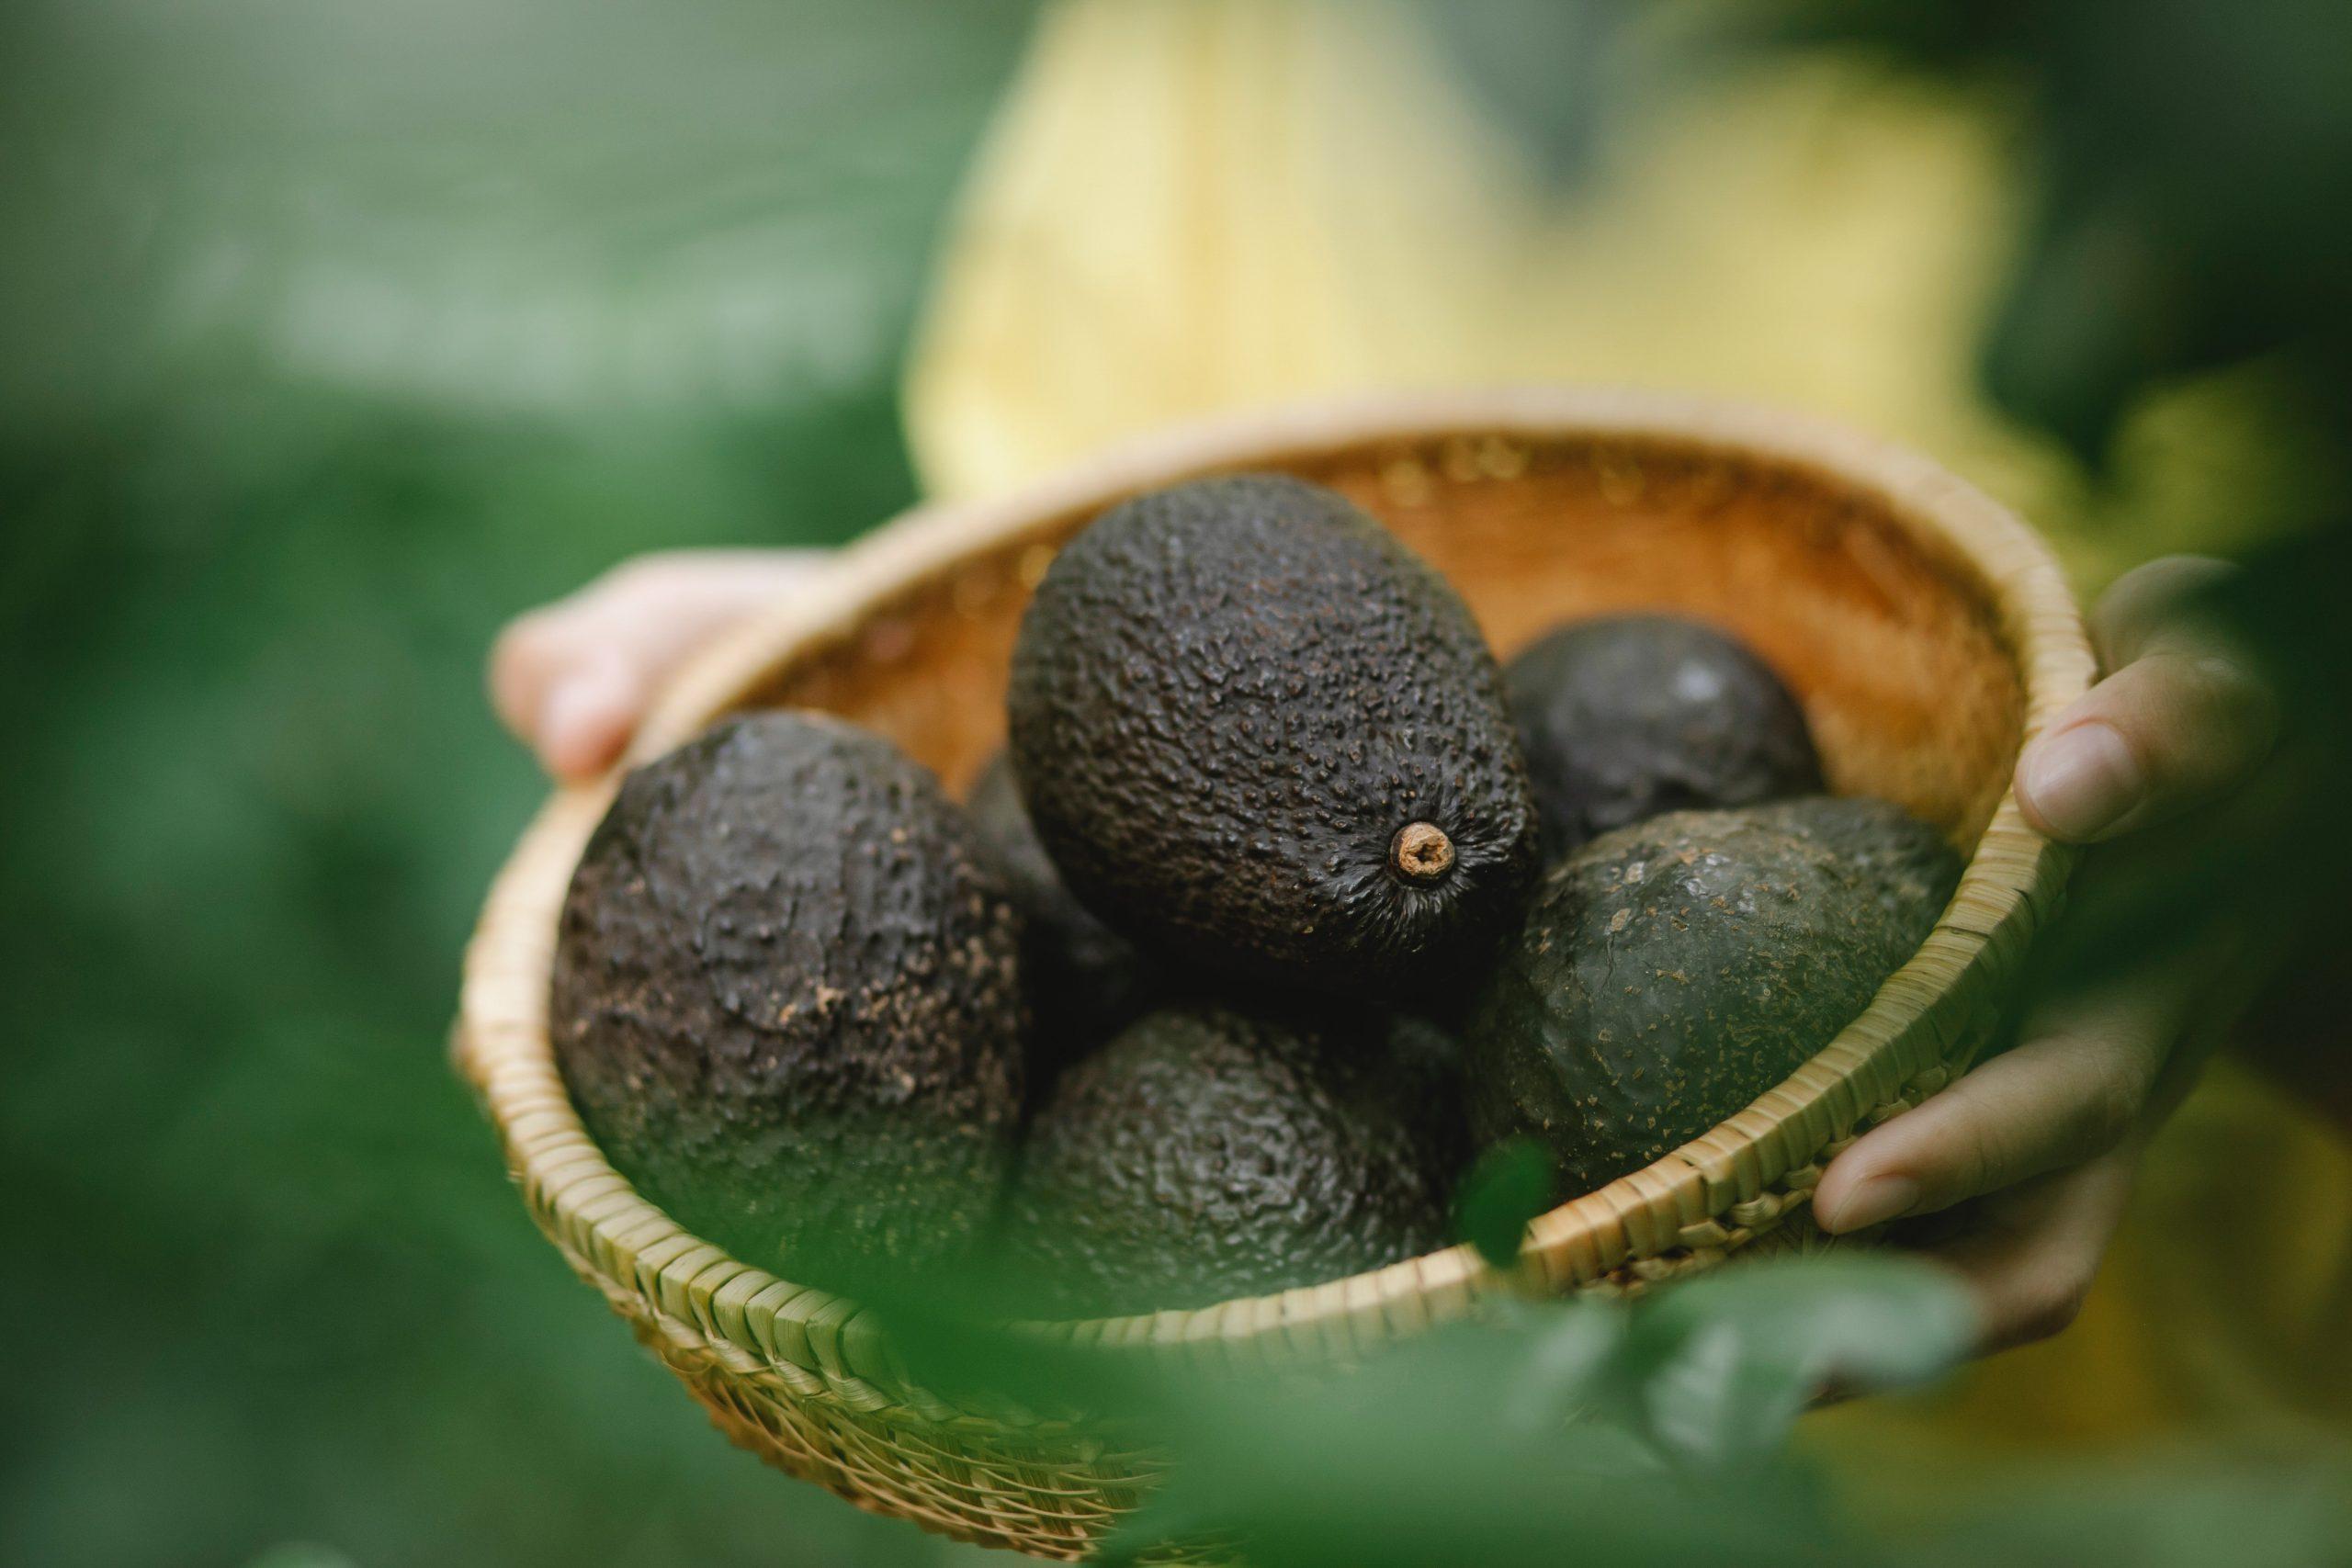 Avocados in a basket